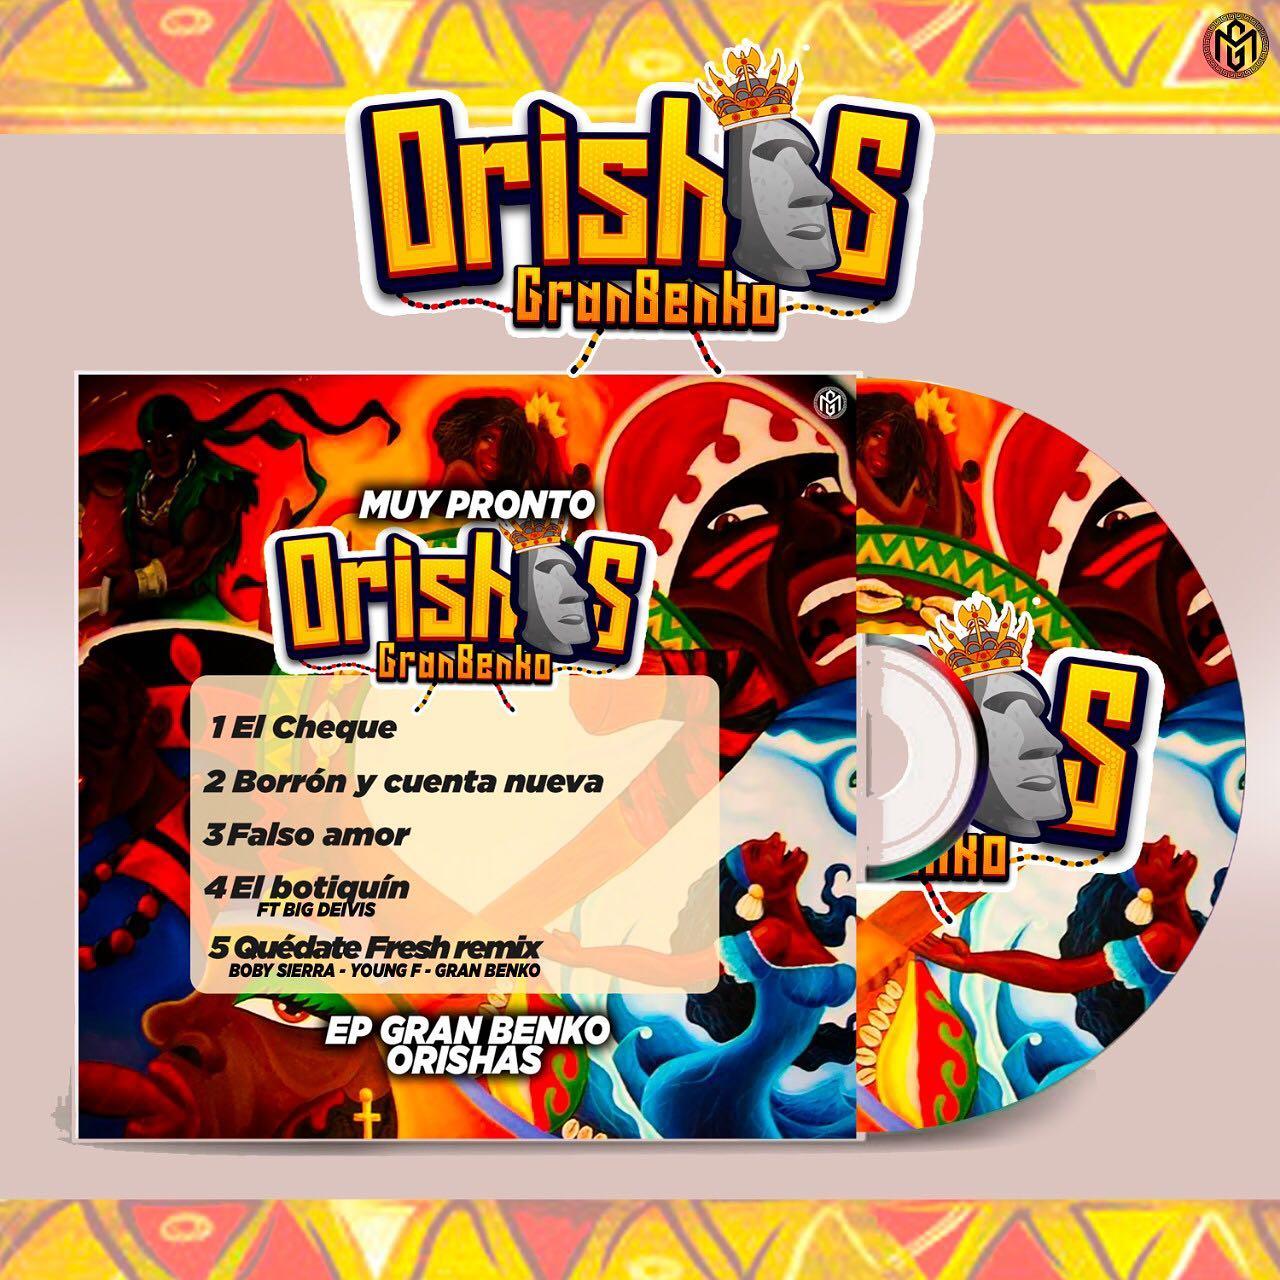 Orishas – Gran Benko Audios Originales 2021 Descarga CHAMPETAS NUEVAS 2021 Mc Car,mr black ,koffe el pitu keyvin samy ray kissinger champeta